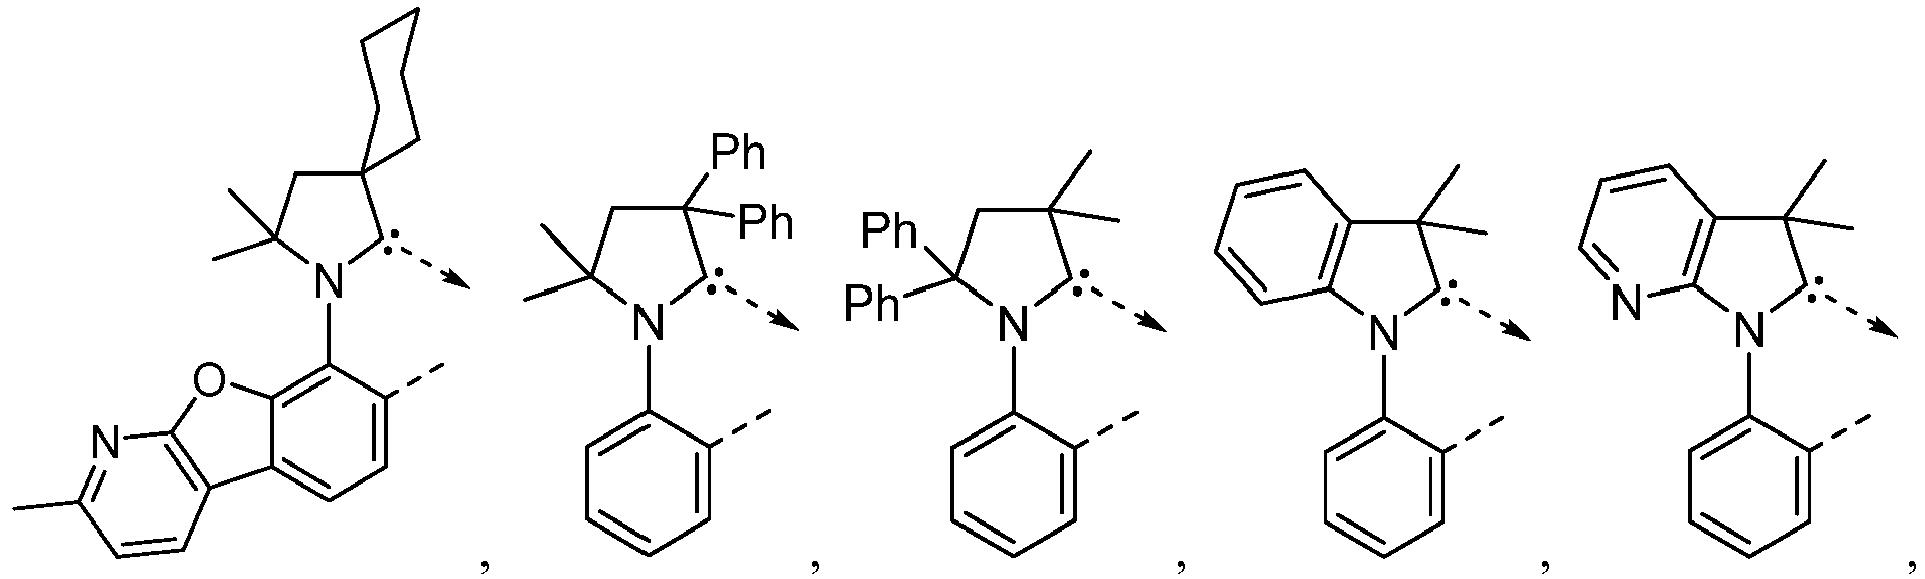 Figure imgb0971